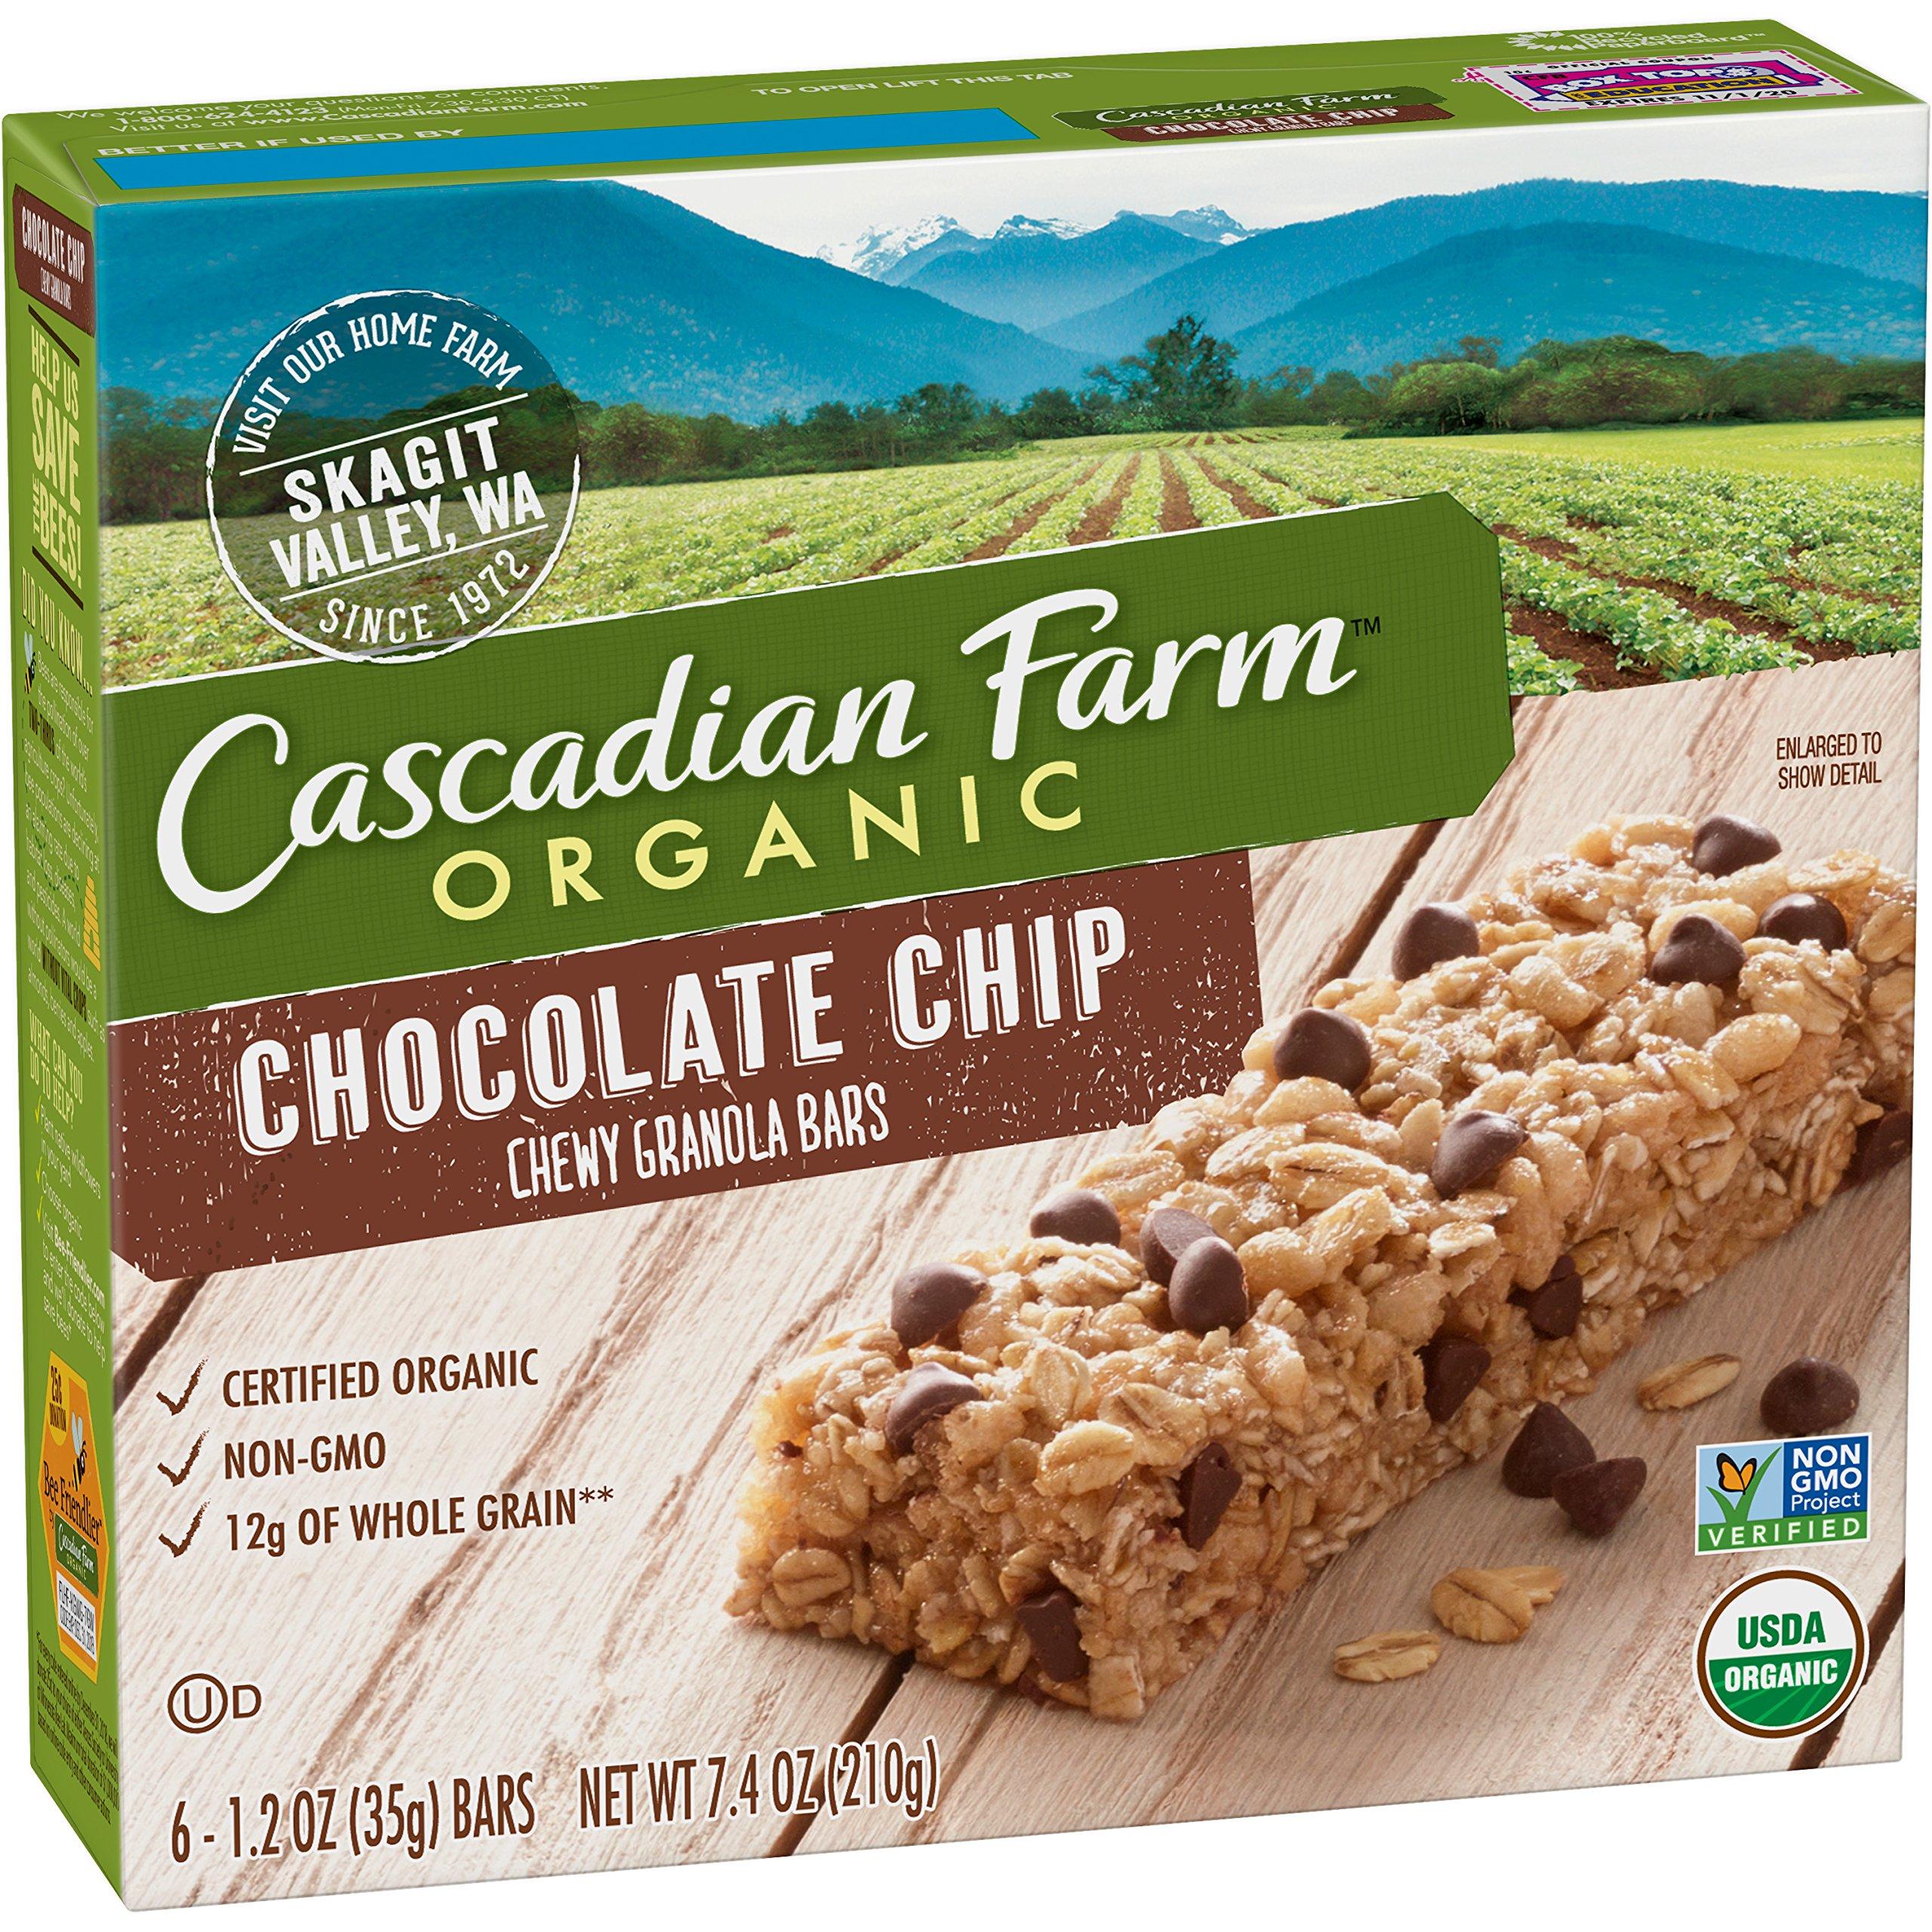 Cascadian Farm Organic Granola Bars, Chocolate Chip Chewy Granola Bars, 6 Bars (Pack of 6) by Cascadian Farm